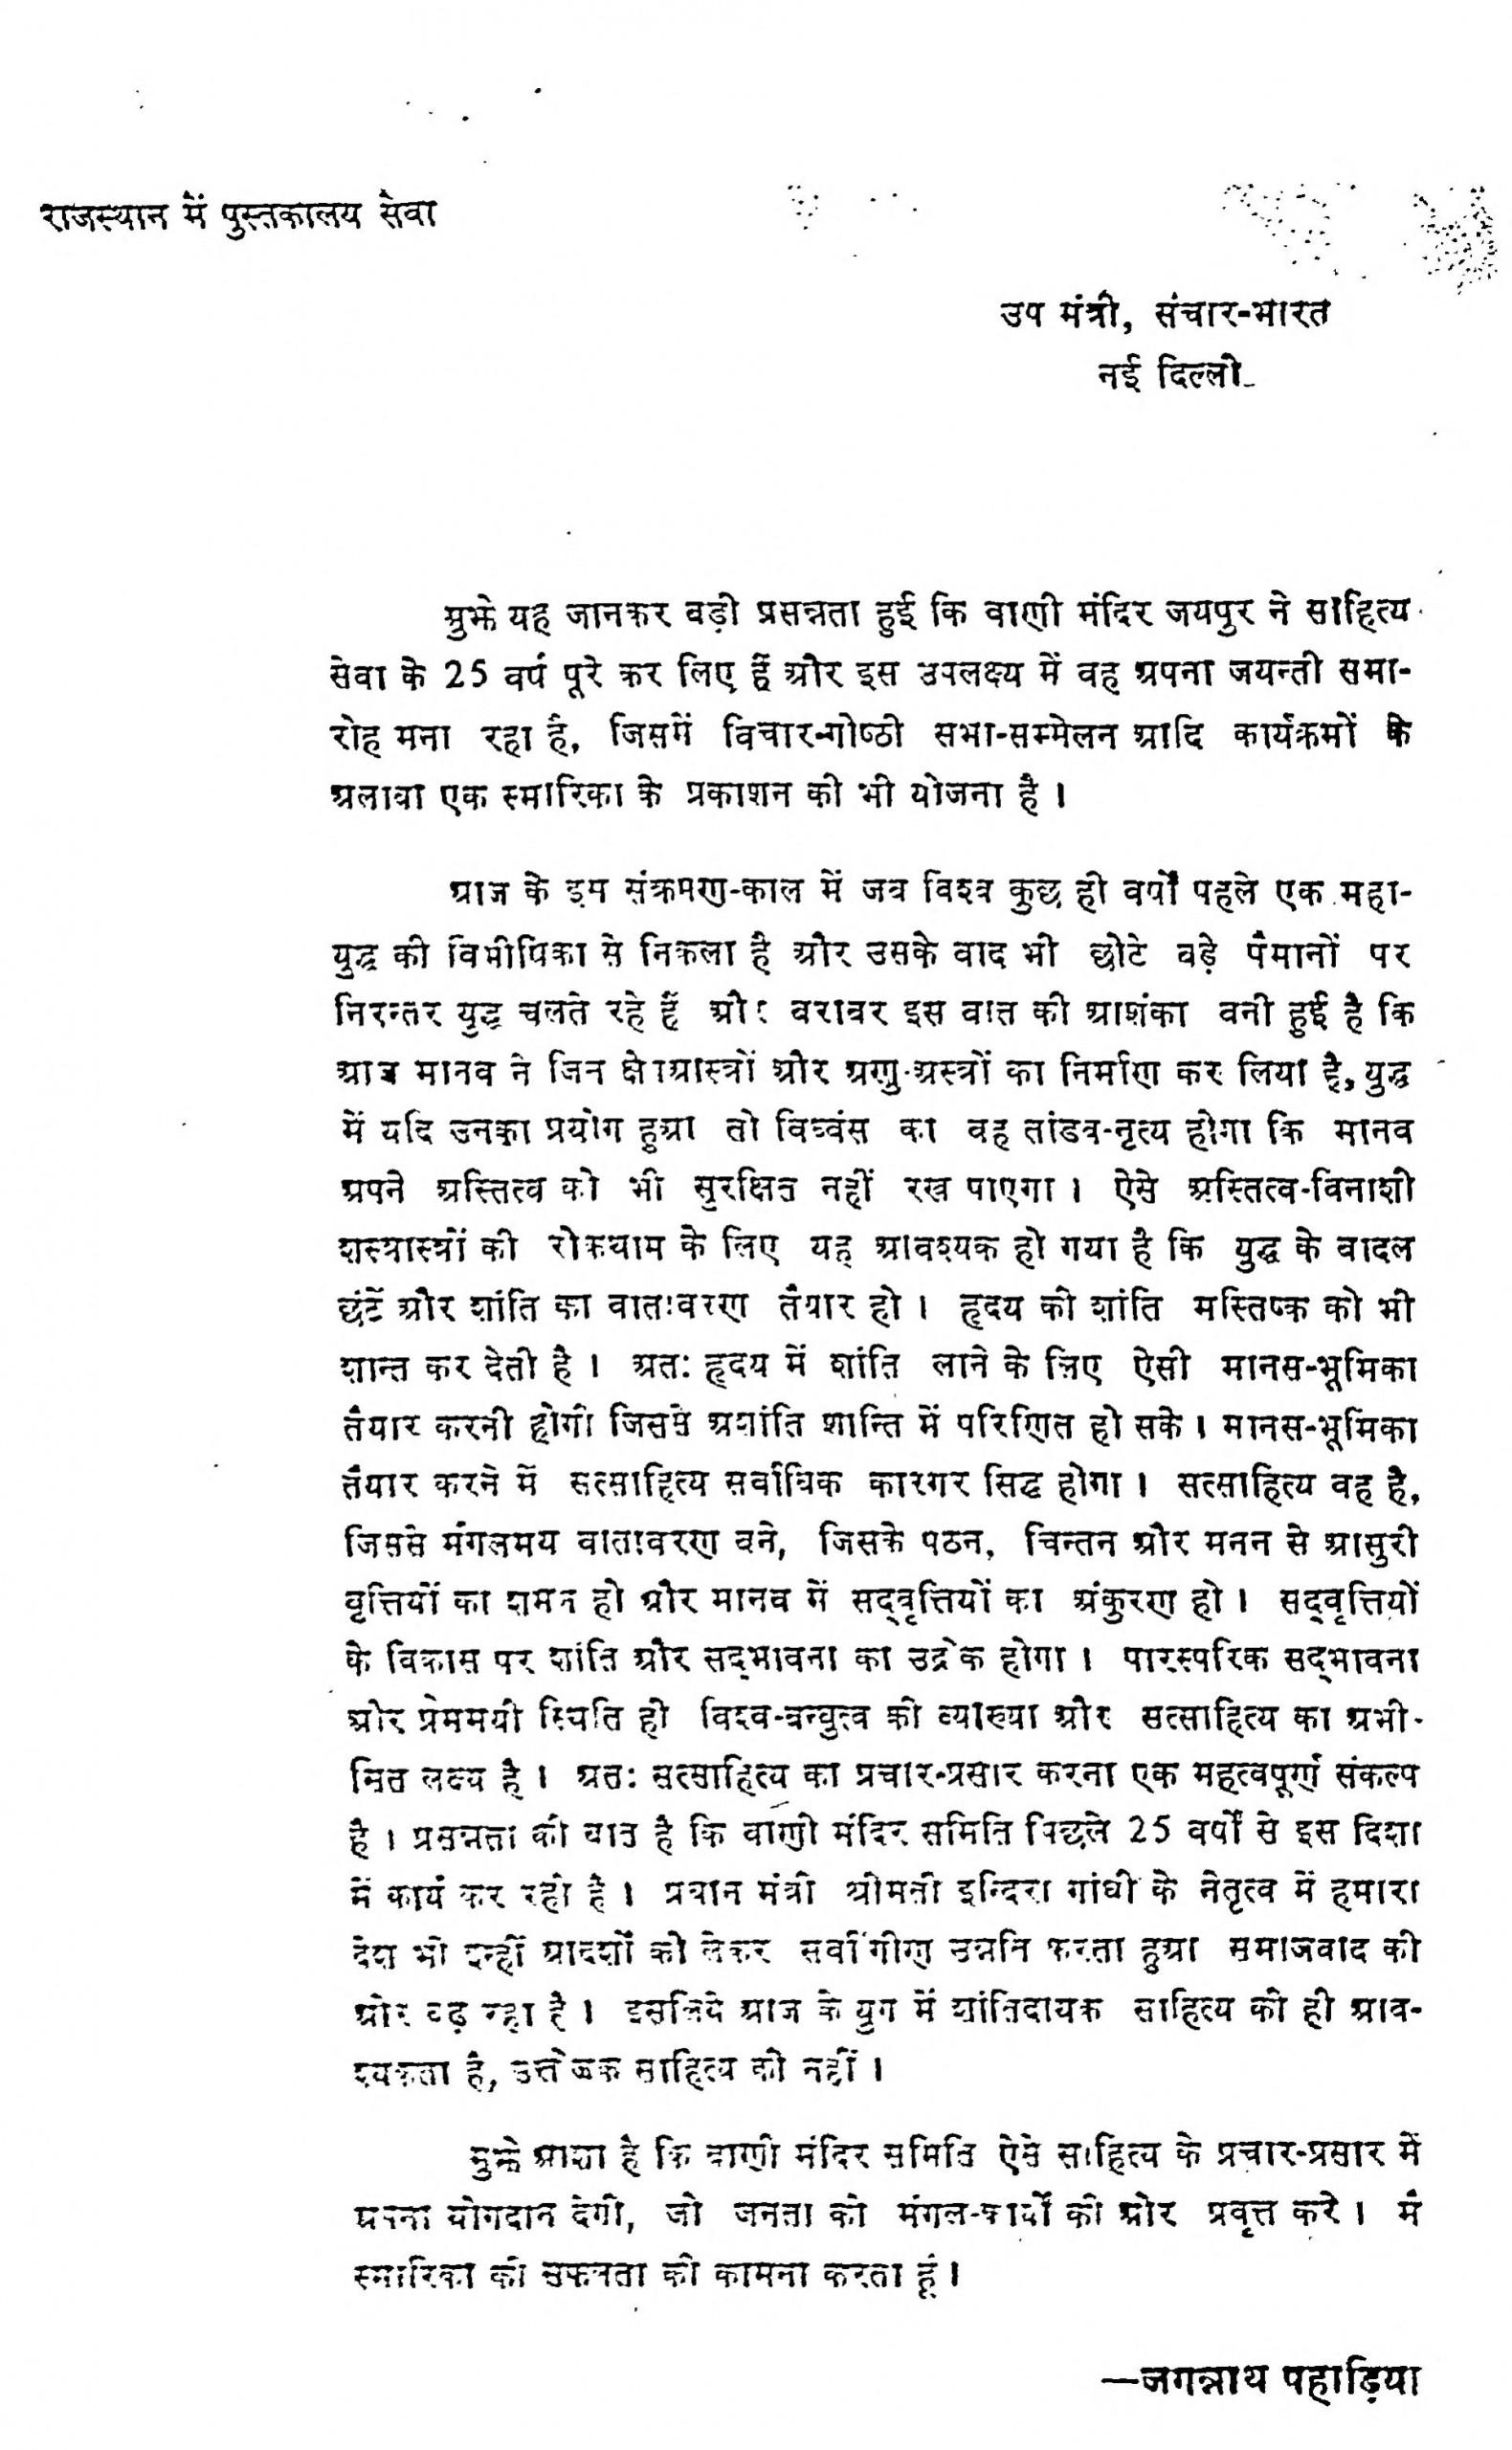 Rajasthan Men Pustakalay Seva by अगरचन्द्र नाहटा - Agarchandra Nahta